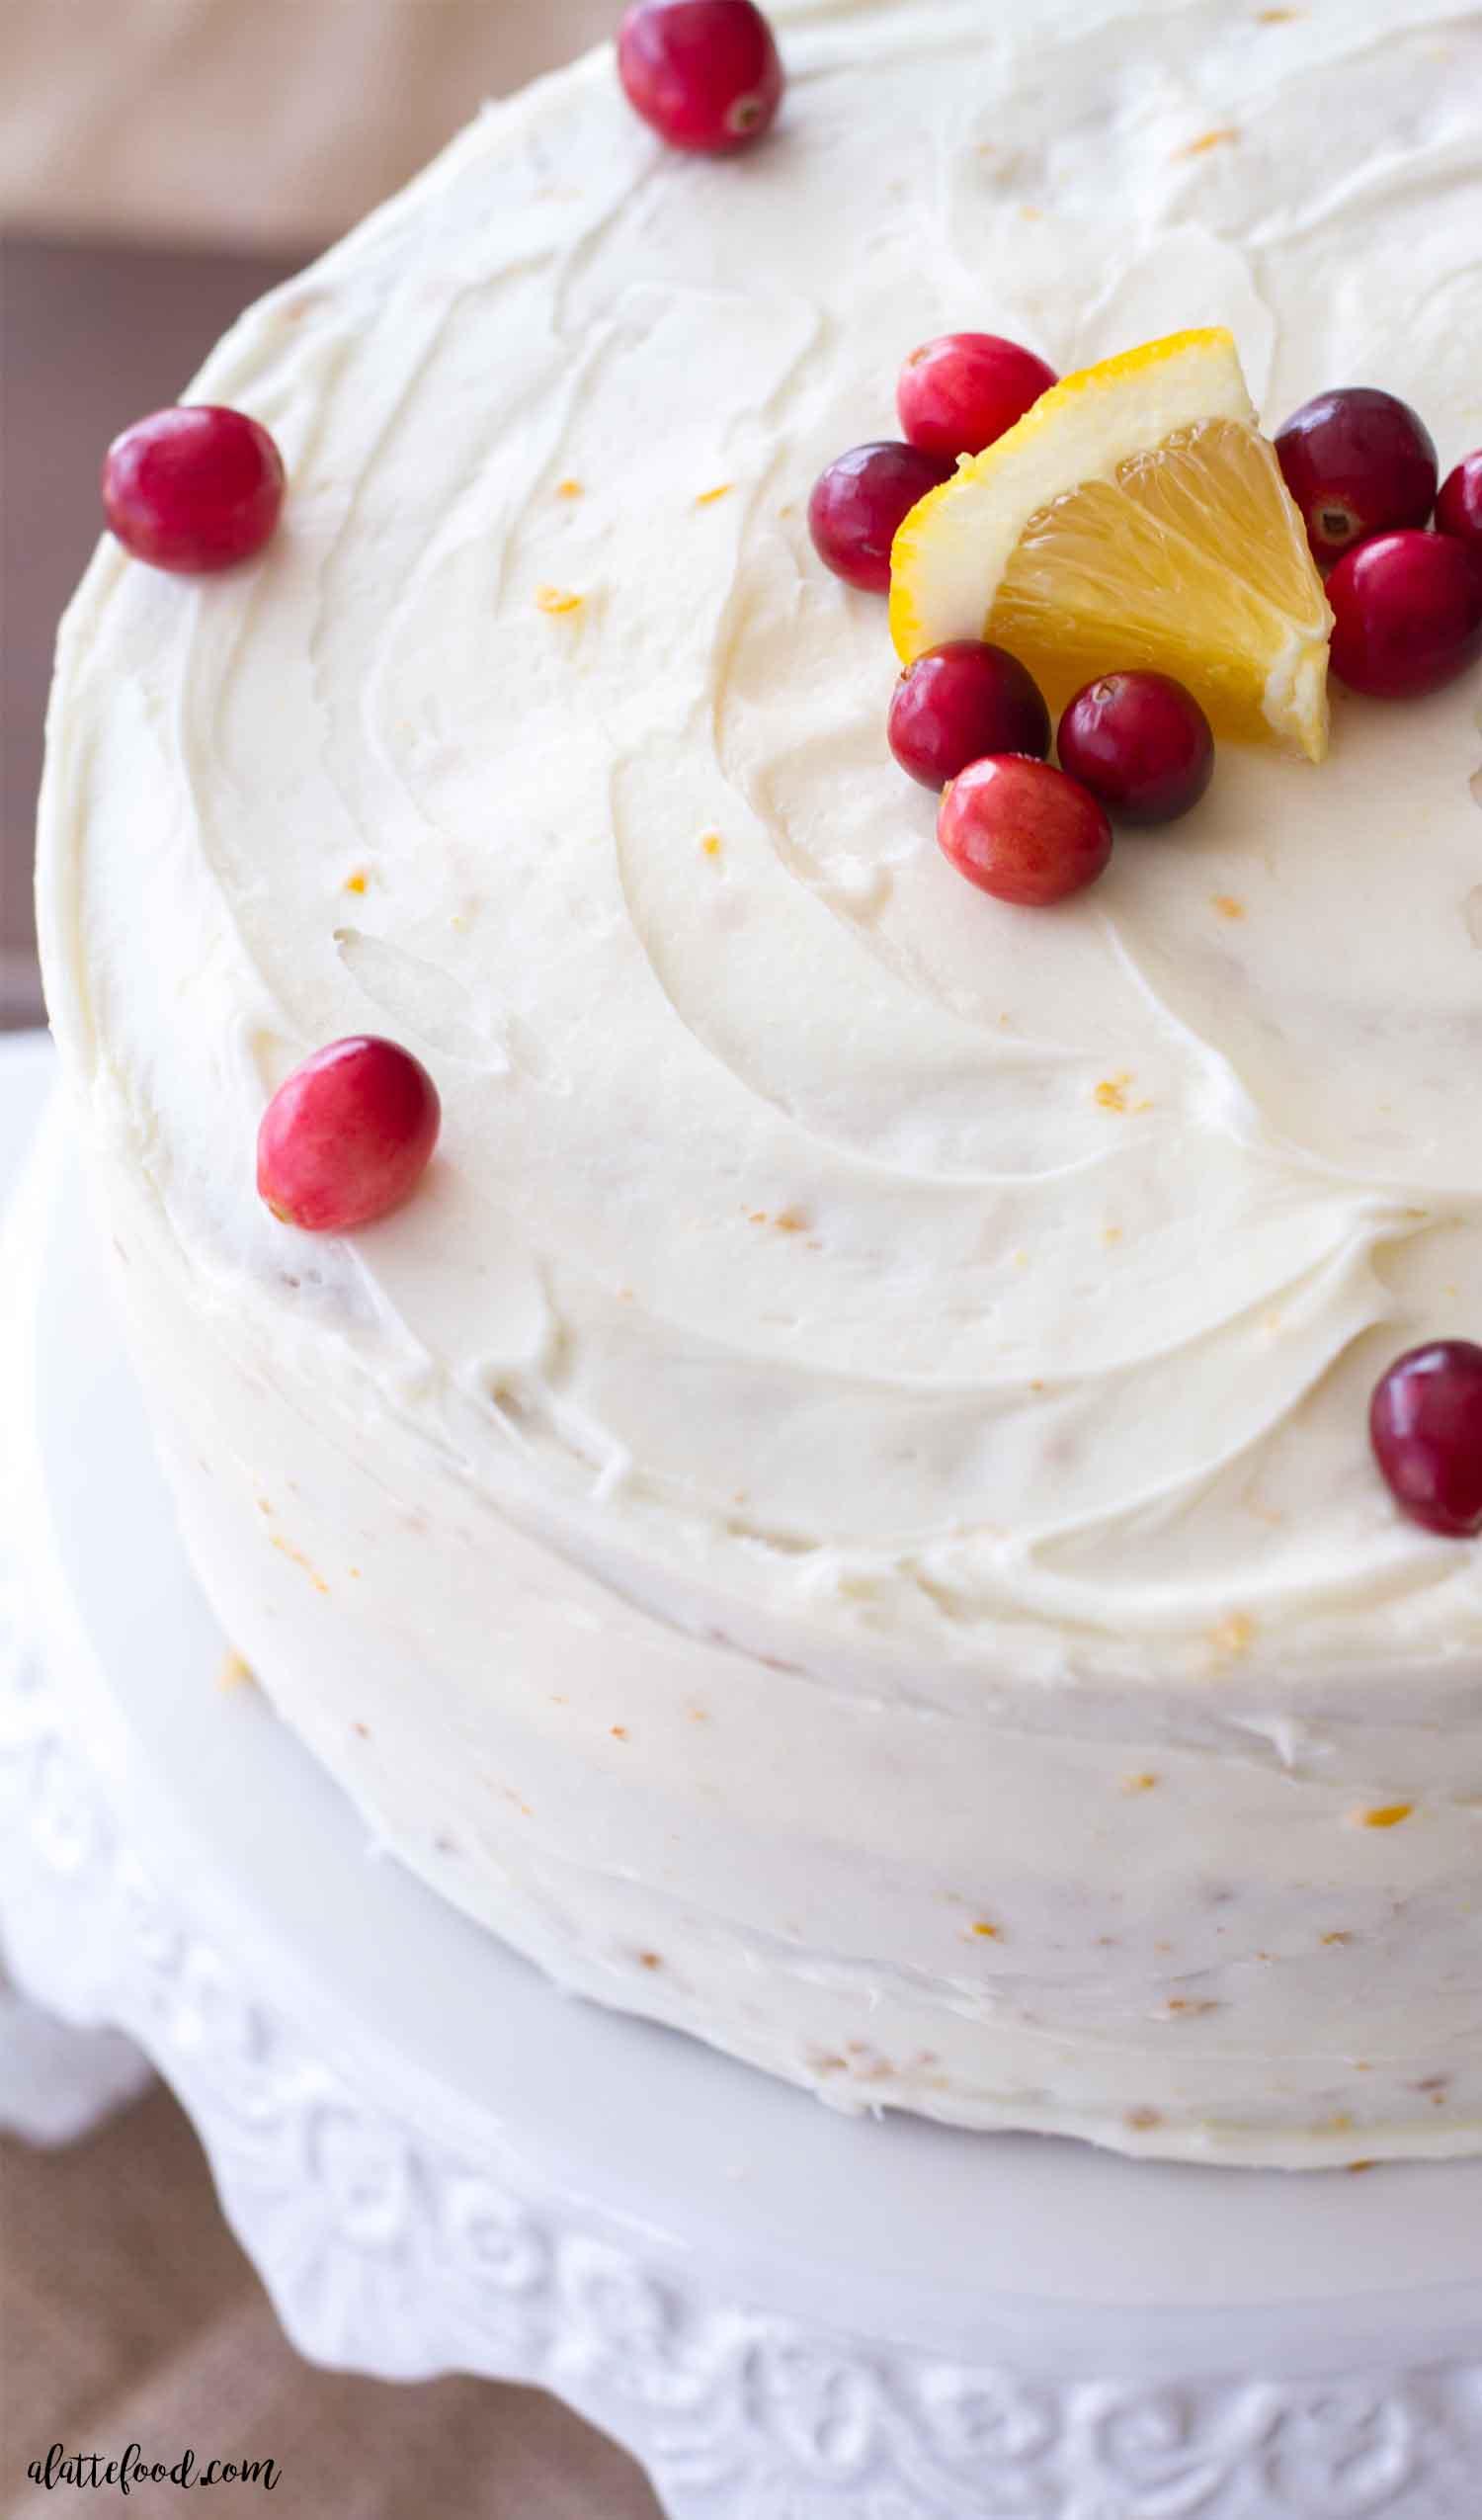 Forum on this topic: Cranberry-Vanilla Cake with Whipped Cream Frosting, cranberry-vanilla-cake-with-whipped-cream-frosting/